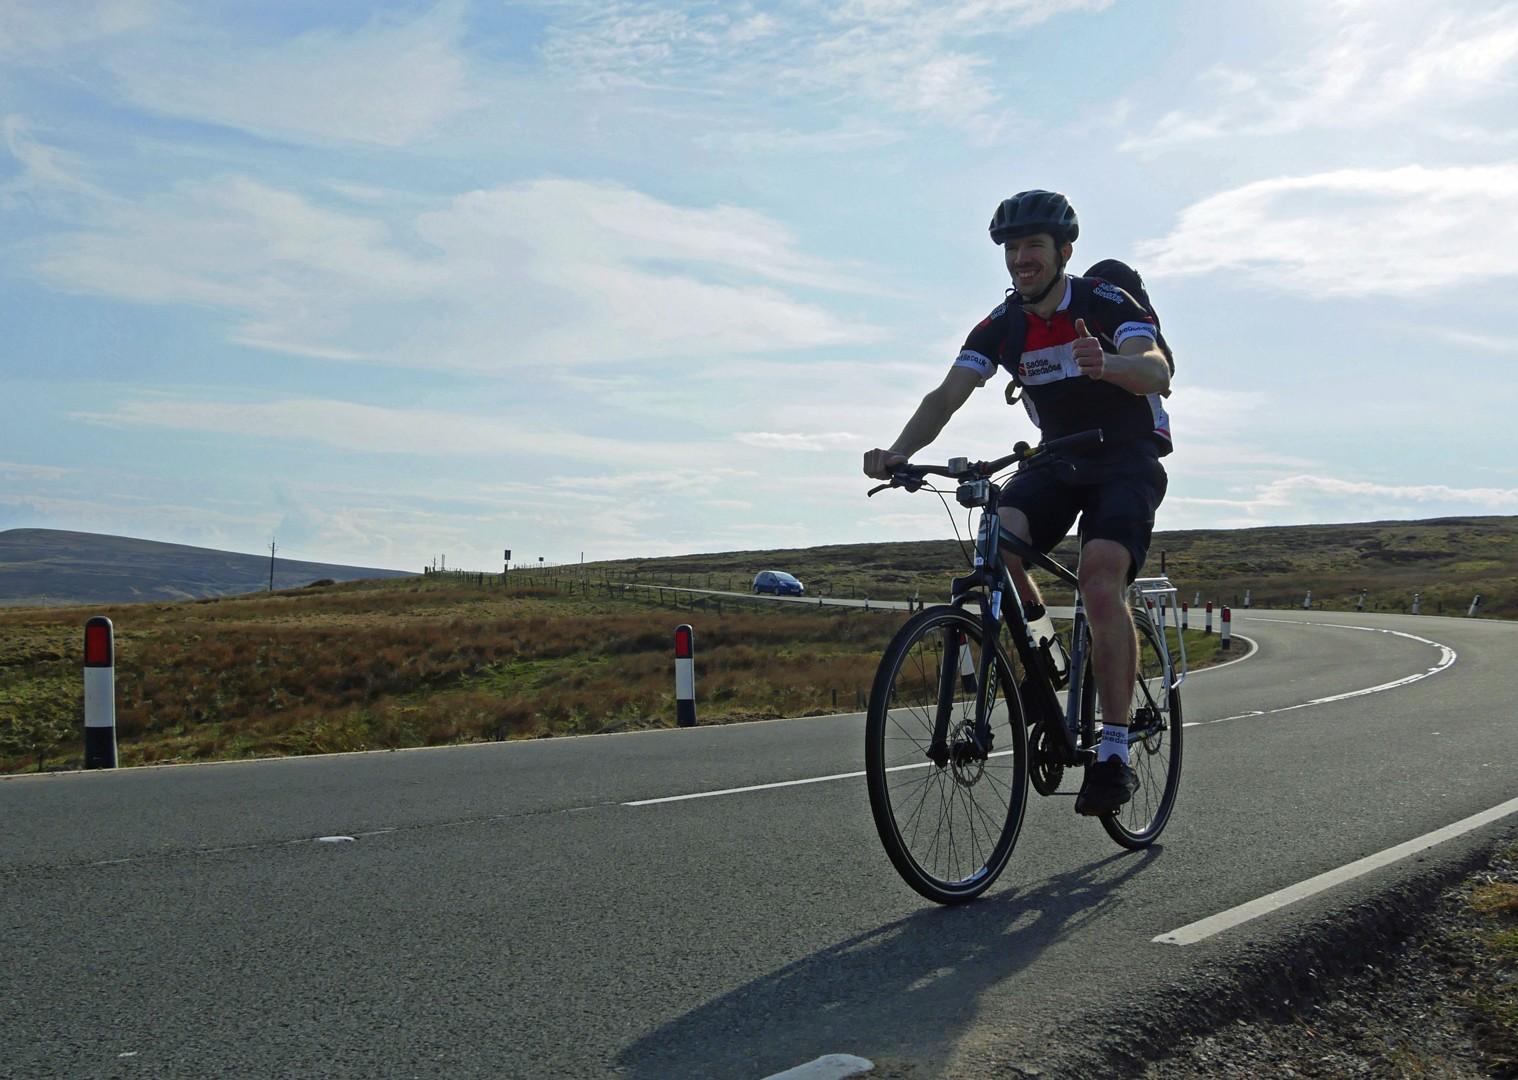 cycling-holiday-c2c-cycling-landscape.jpg - UK - C2C - Coast to Coast 5 Days Cycling - Self-Guided Leisure Cycling Holiday - Leisure Cycling